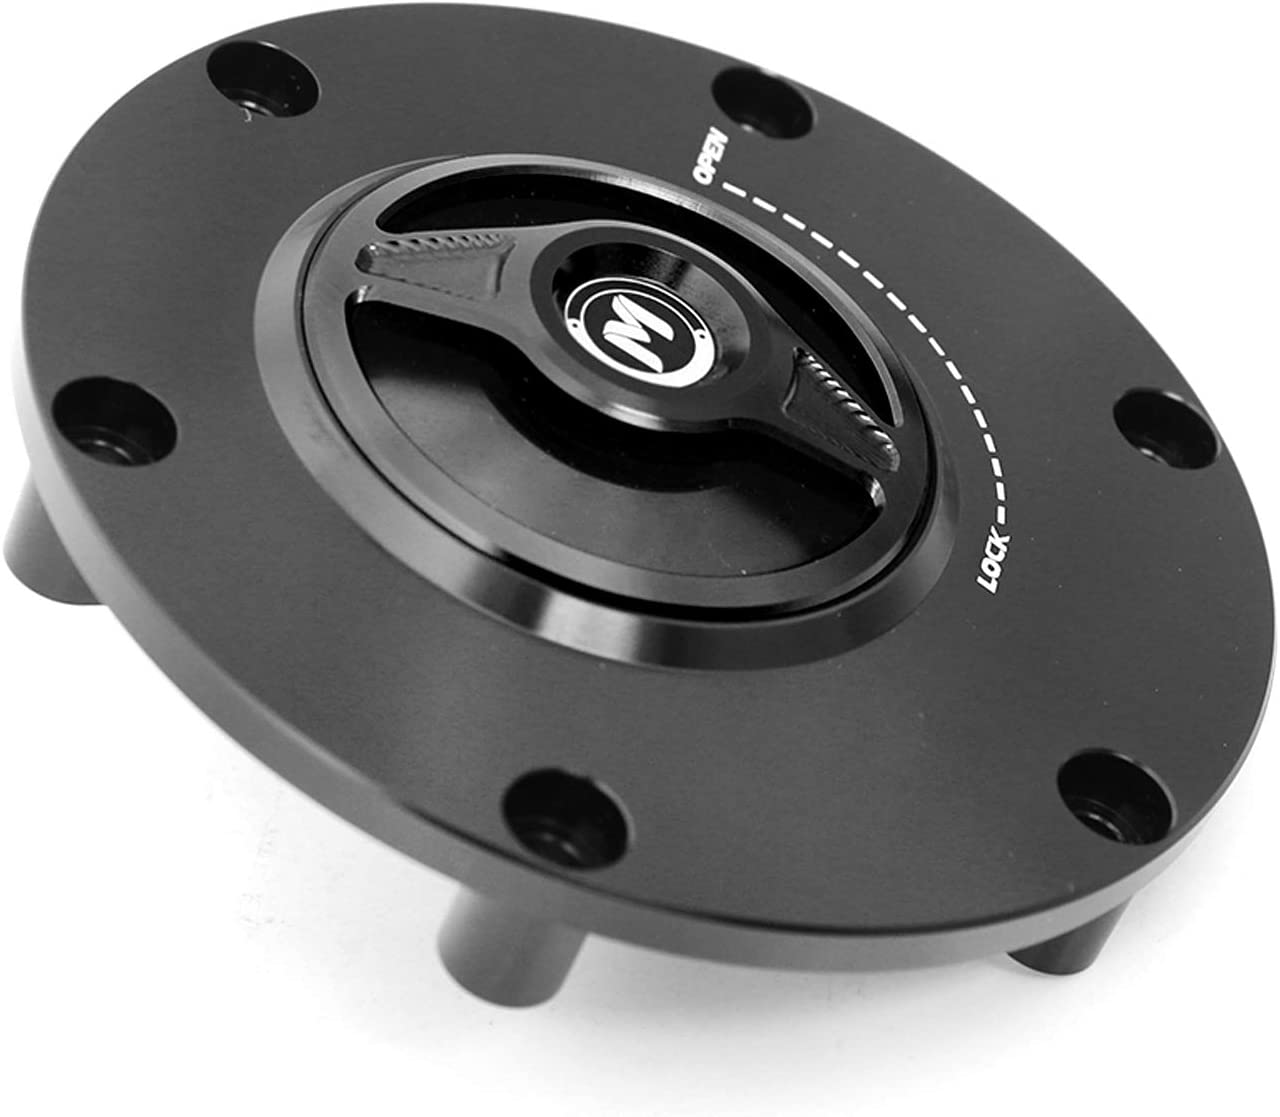 Quick Lock//Release Body-Handle-Cap = Black-Black-Black for Triumph Daytona T595 Blade Style Keyless Autobahn88 Motorcycle Fuel Tank Cap , All Year